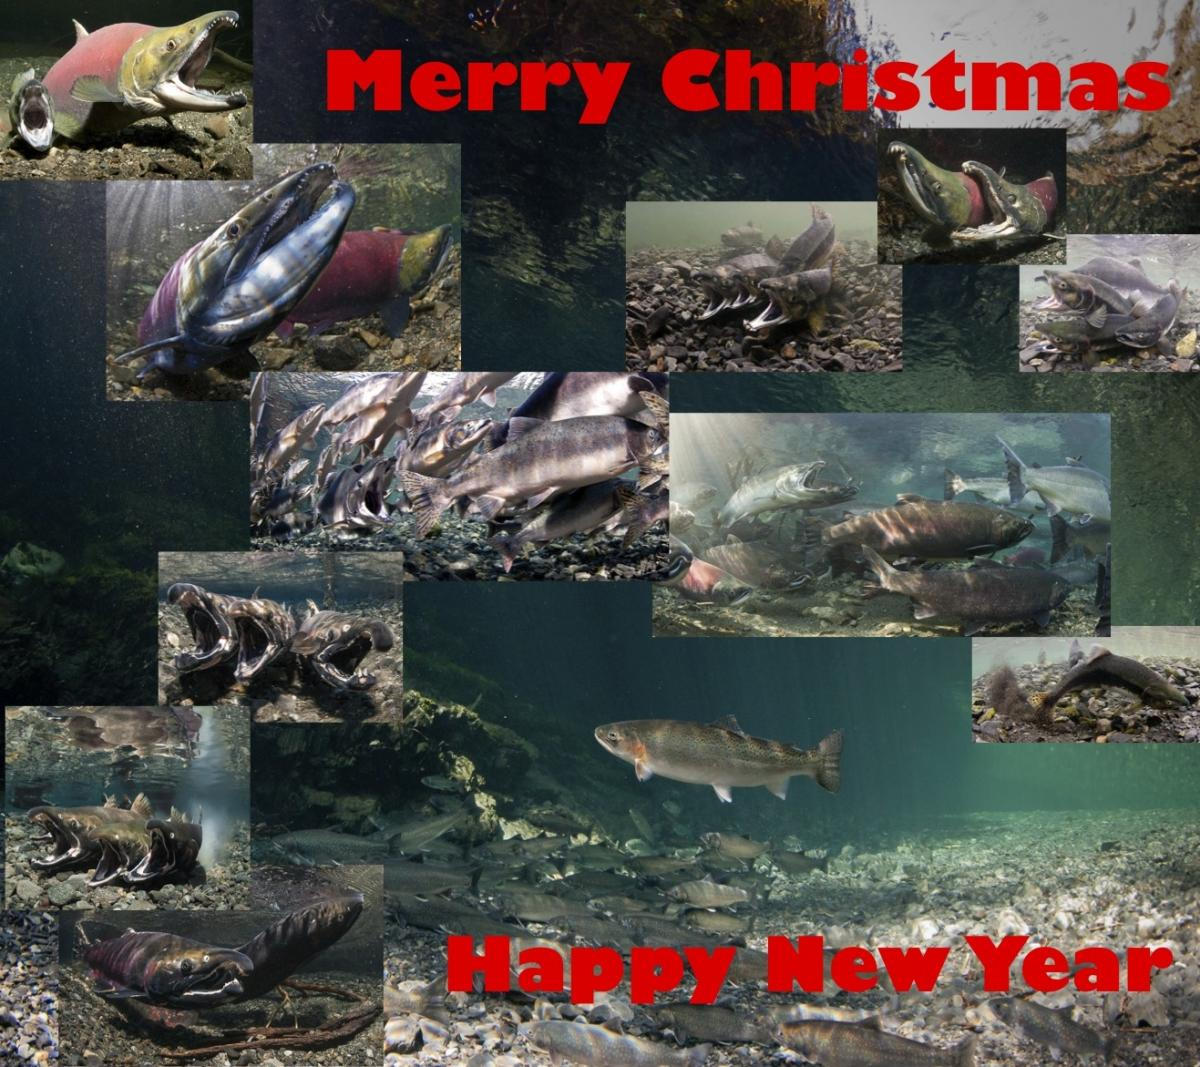 Merry Christmas 2012.jpg